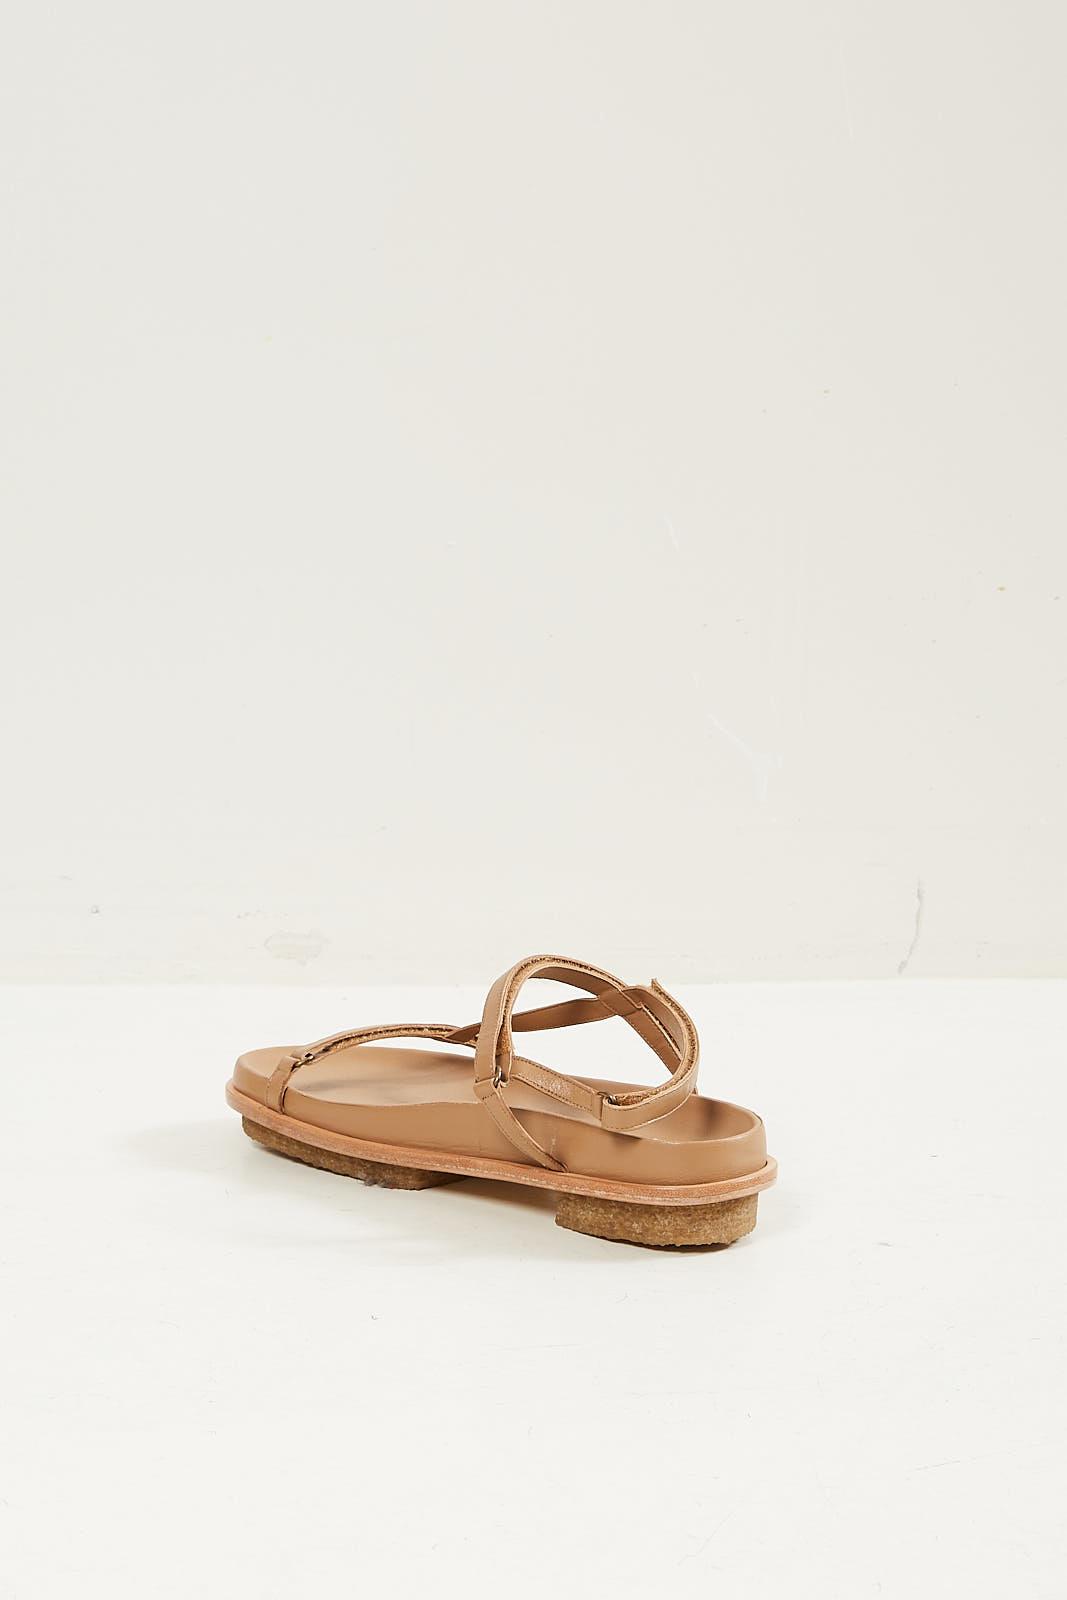 Mari Giudicelli - Isabel sandal camel